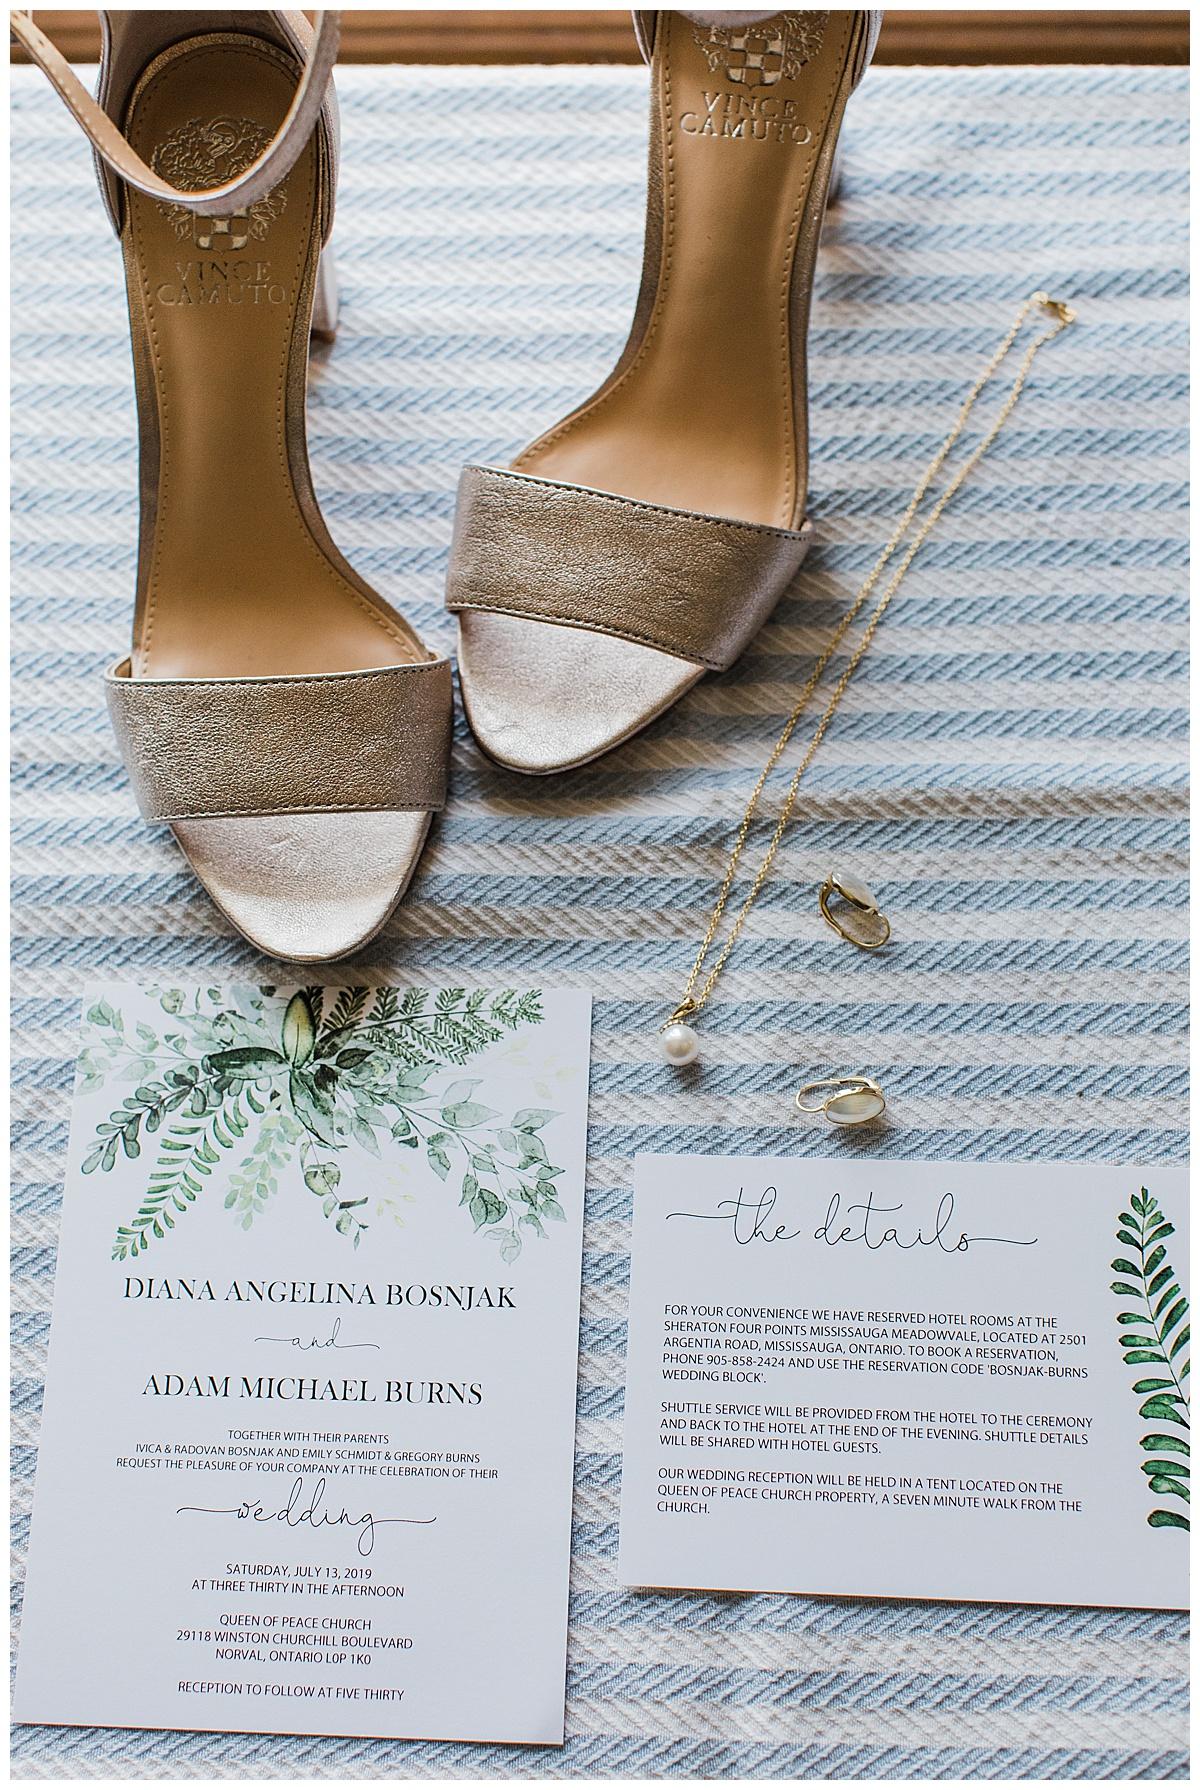 Gold wedding shoes, wedding invitations and bridal jewelry  Georgetown, Ontario Wedding  Toronto Wedding Photographer  3photography